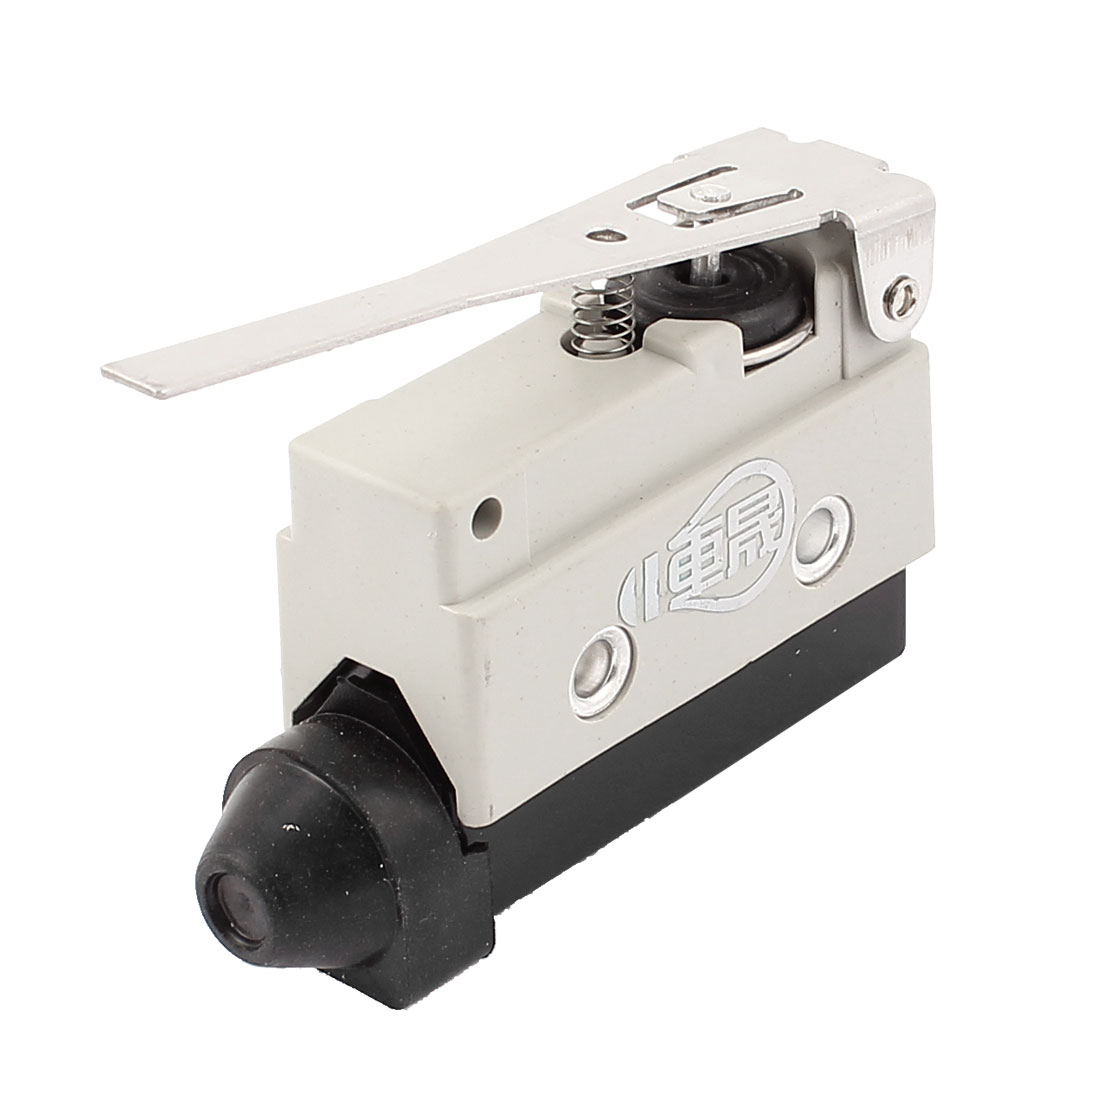 AC 380V 10A Hinge Lever Type SPDT Snap Action Limit Switch TZ-7120